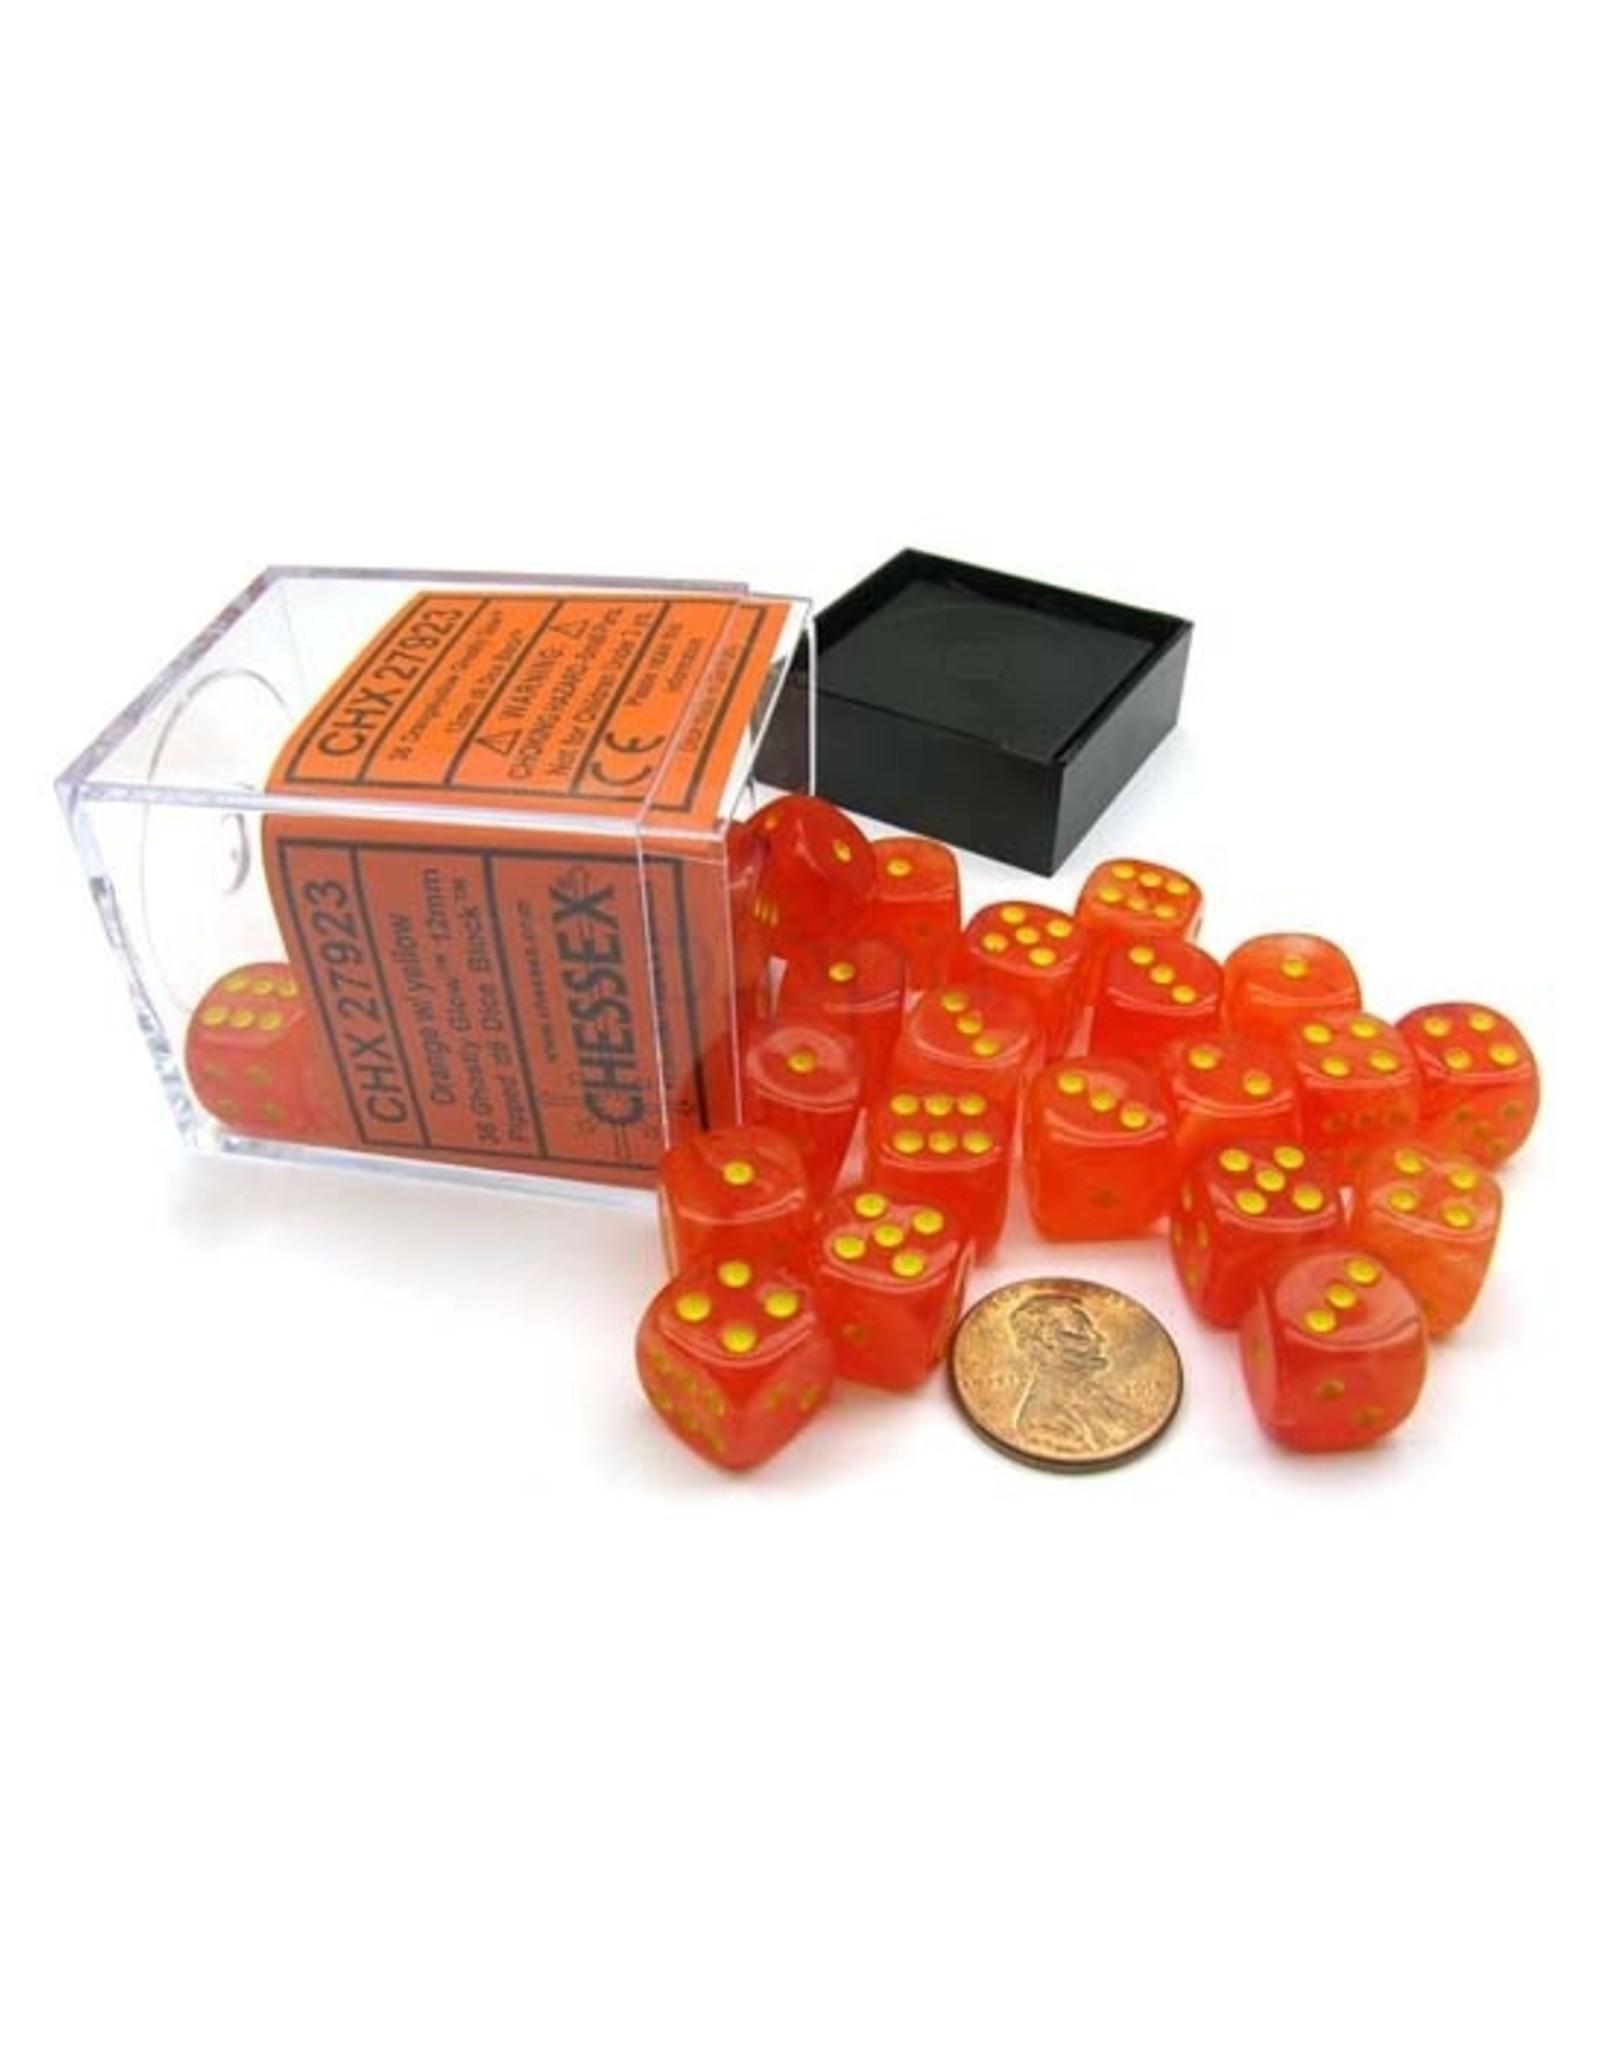 Chessex Chessex: 12mm D6 - Ghostly Glow - Orange w/ Yellow